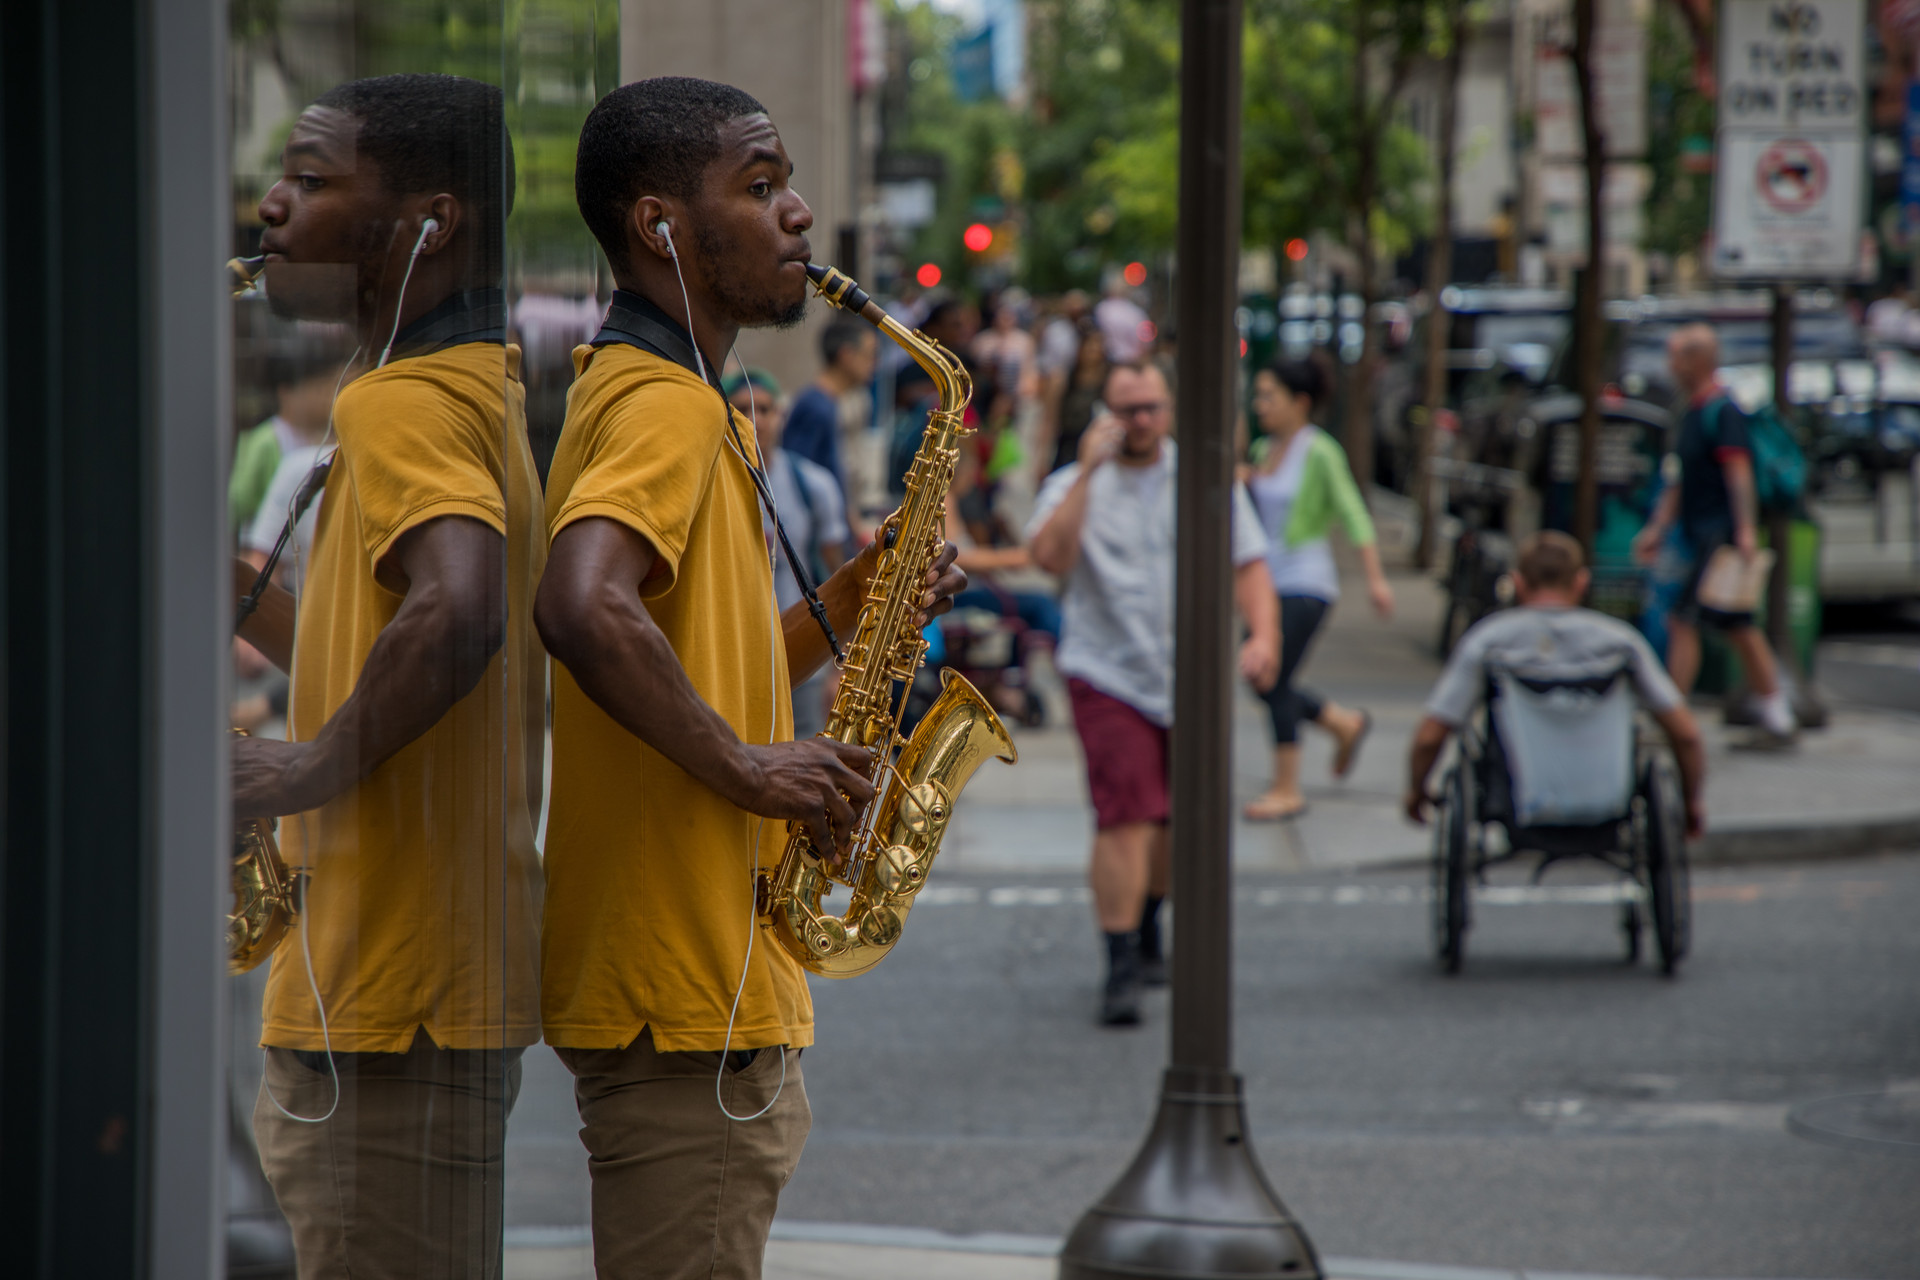 Elijah: Saxophonist, College Student